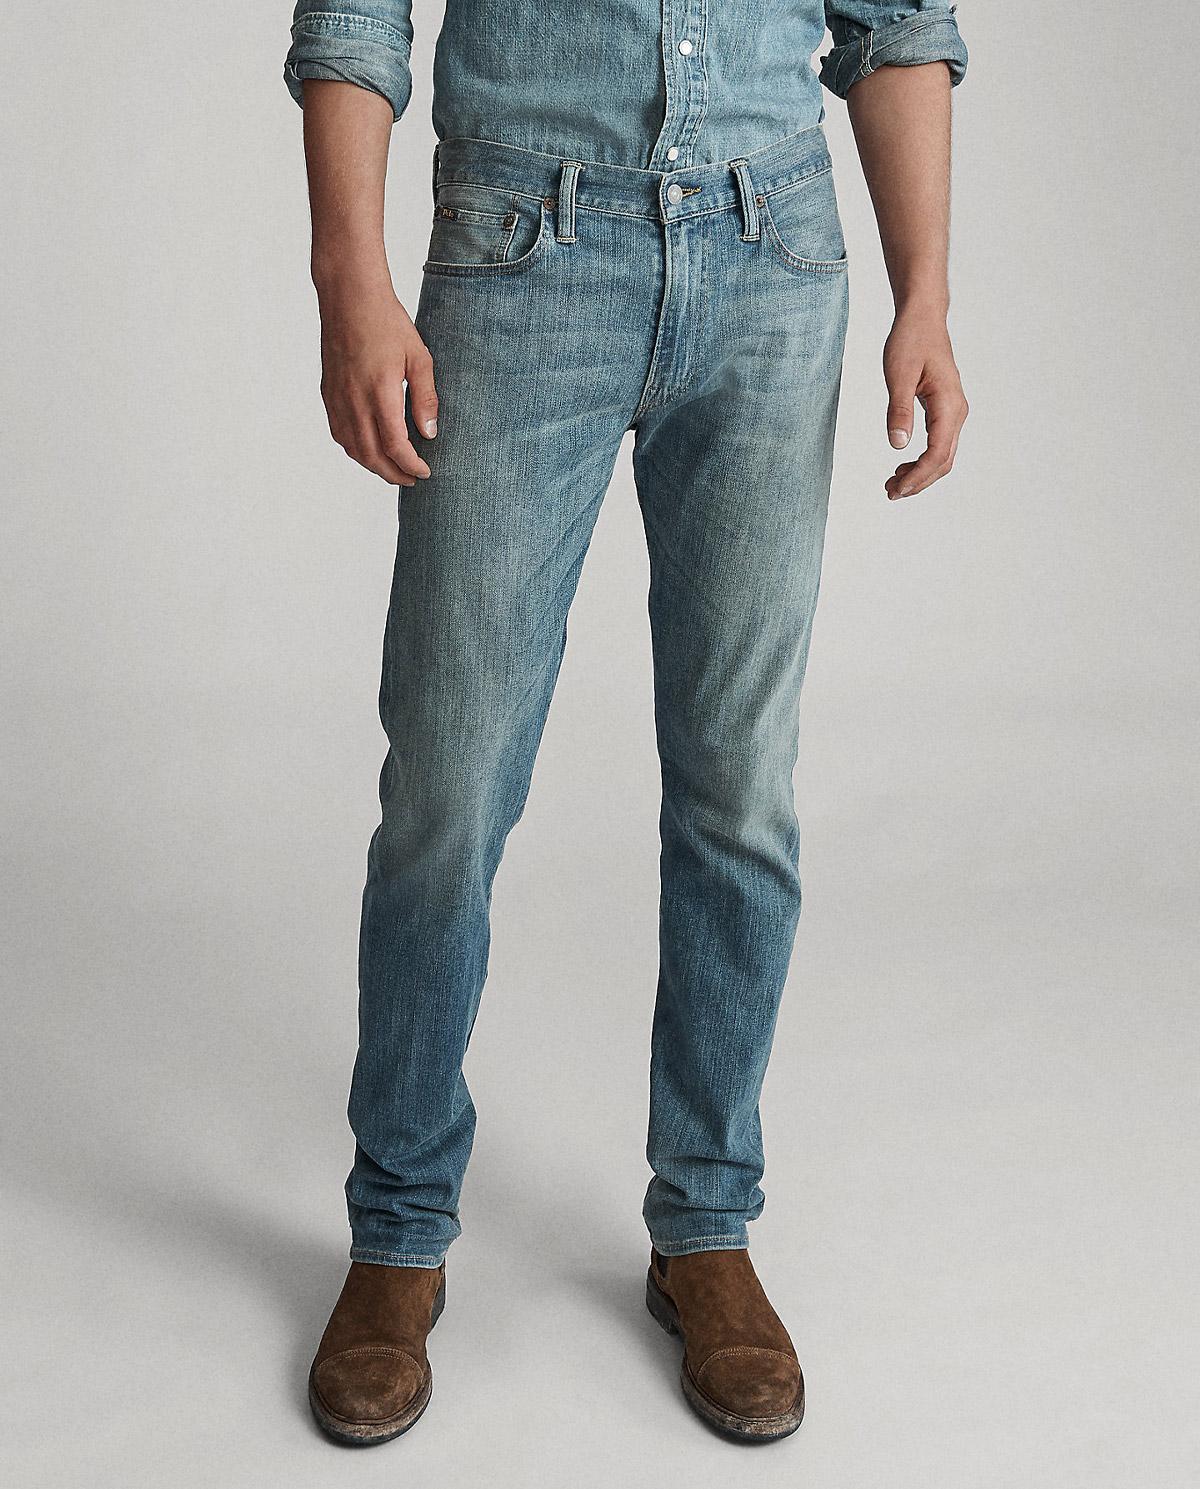 Jeansy Varick Slim Straight Polo Ralph Lauren 710613952011